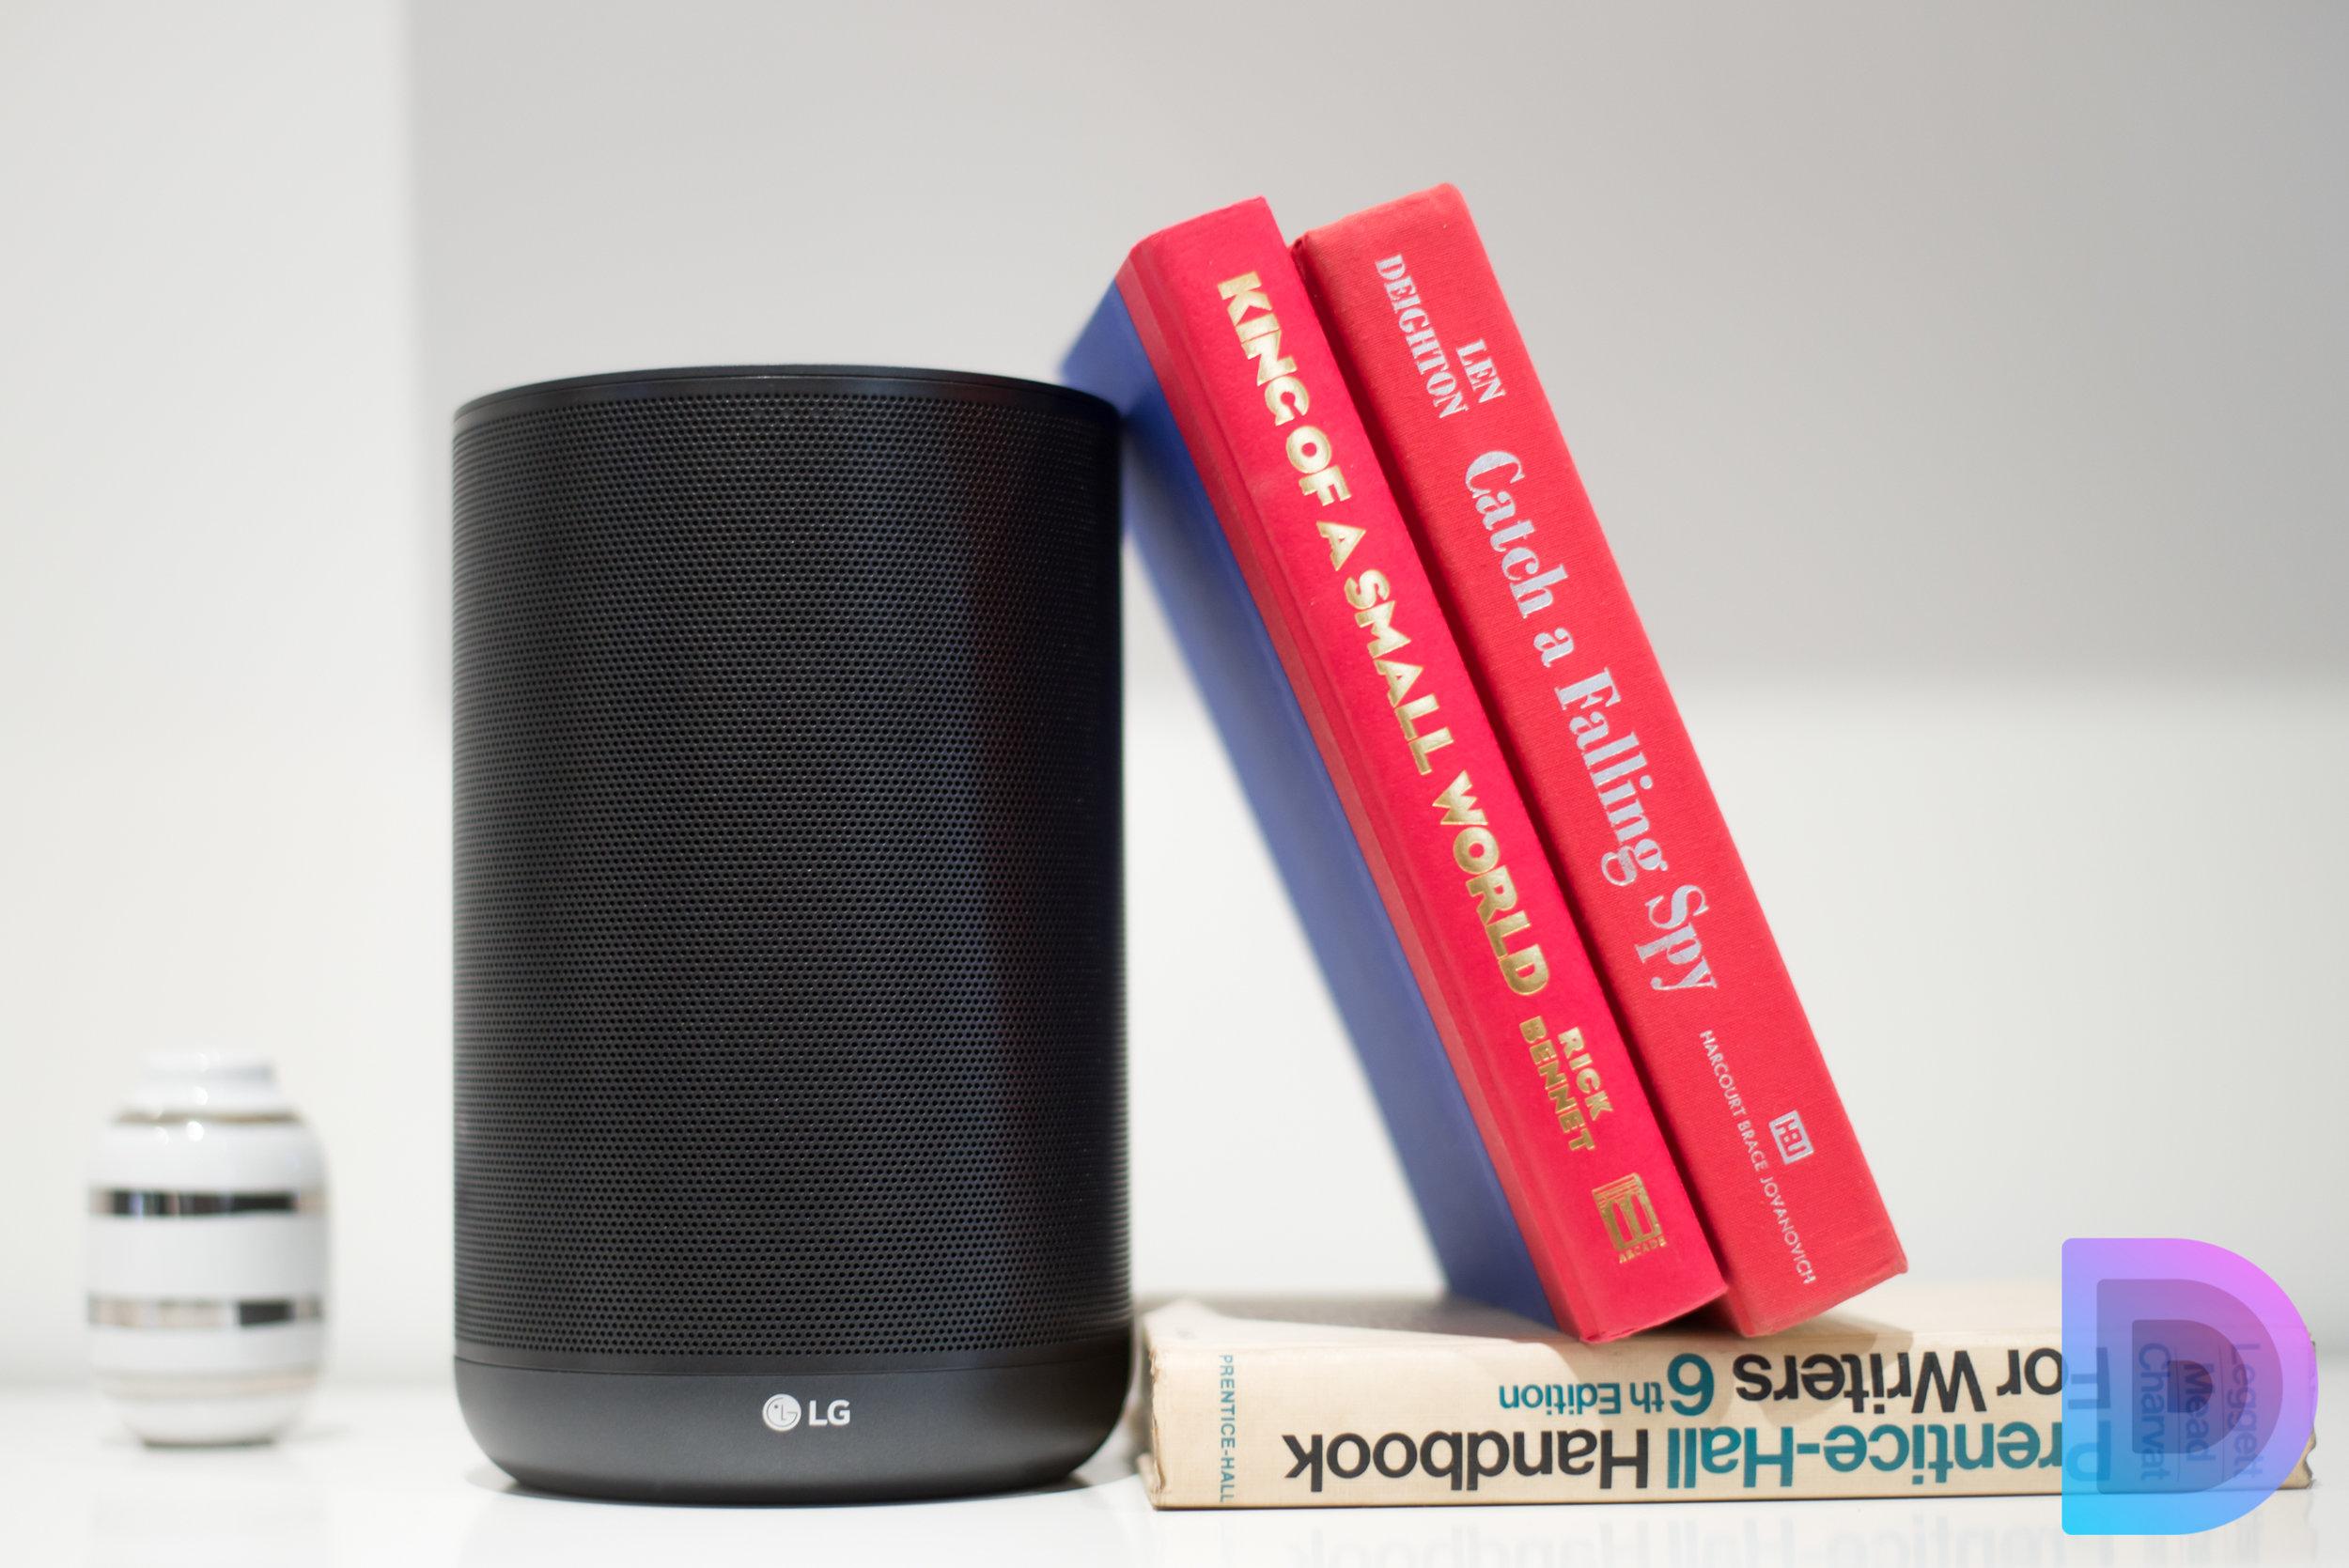 LG-ThinkQ-Speaker-1.JPG